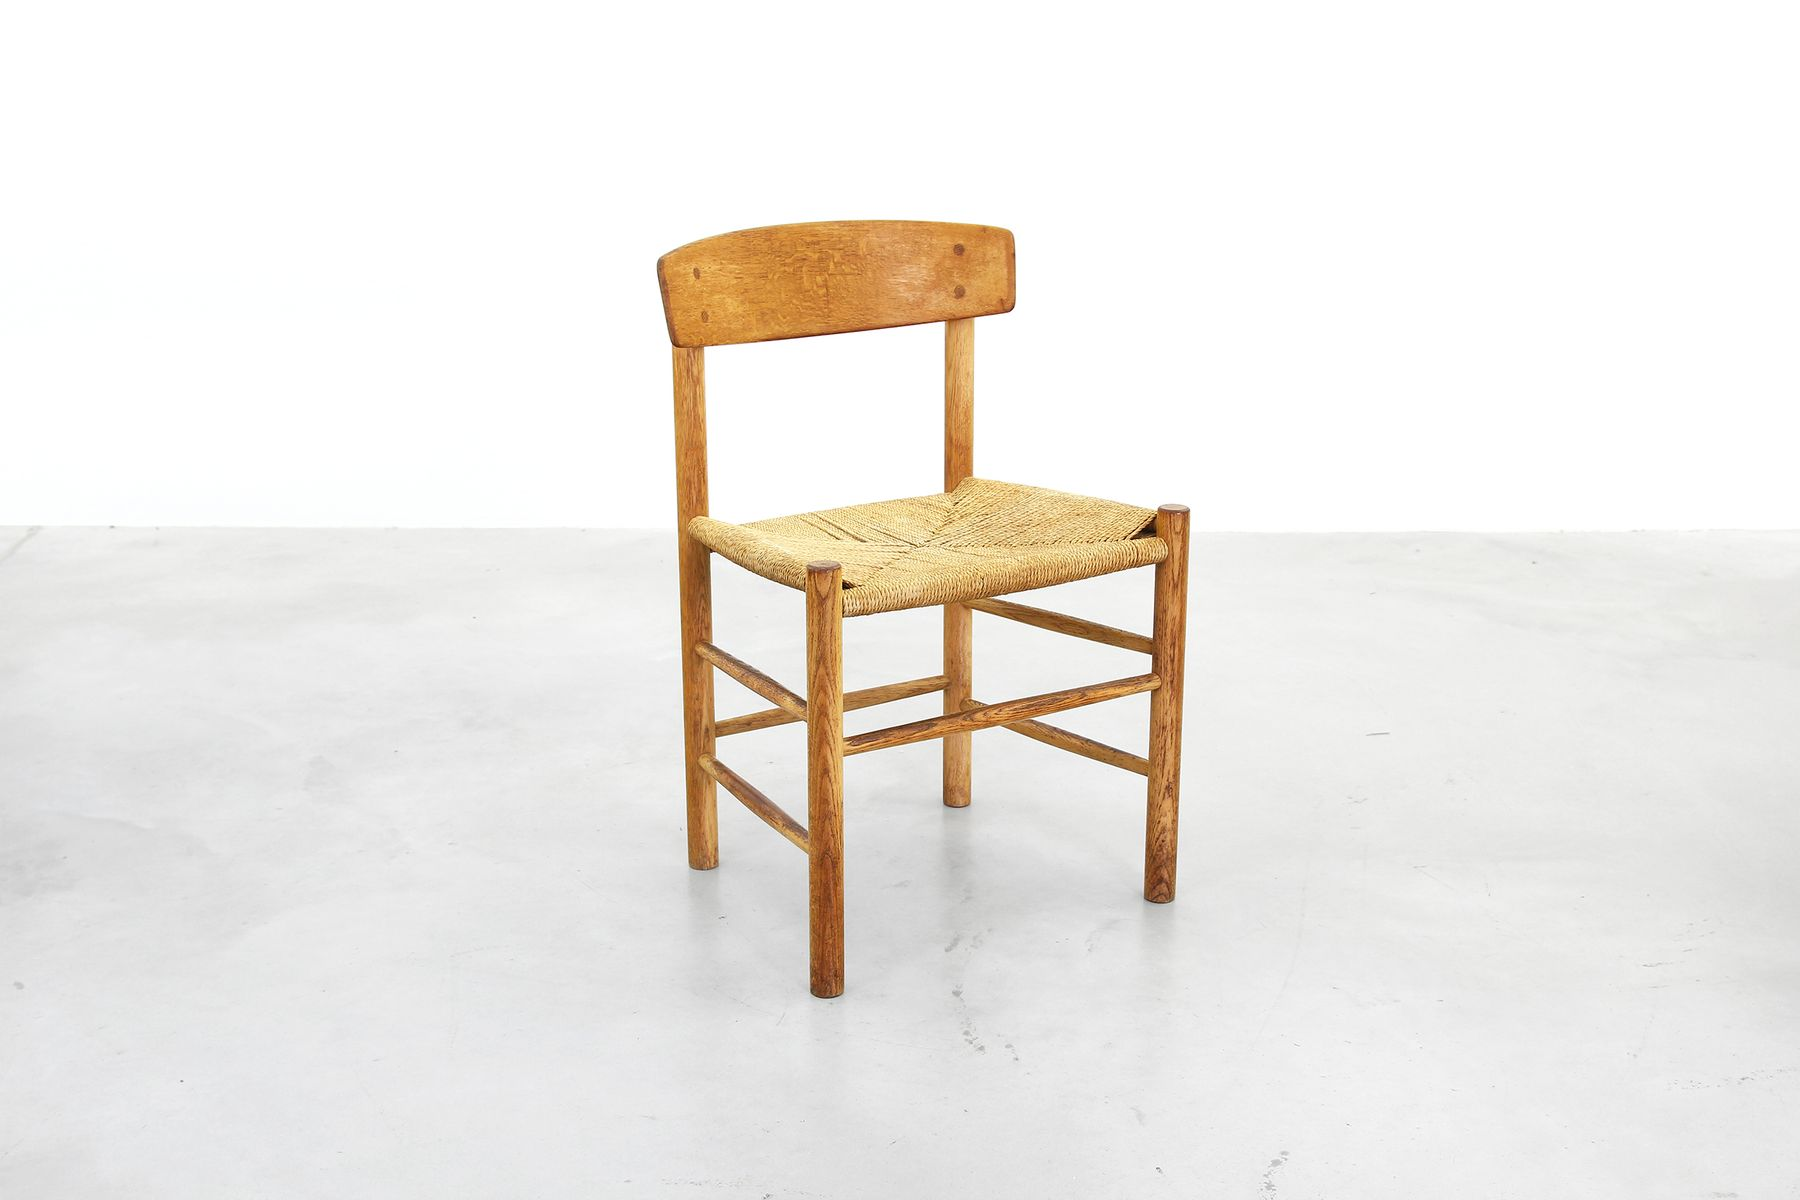 Chaises de salle manger j39 par b rge mogensen pour for Salle a manger 1960